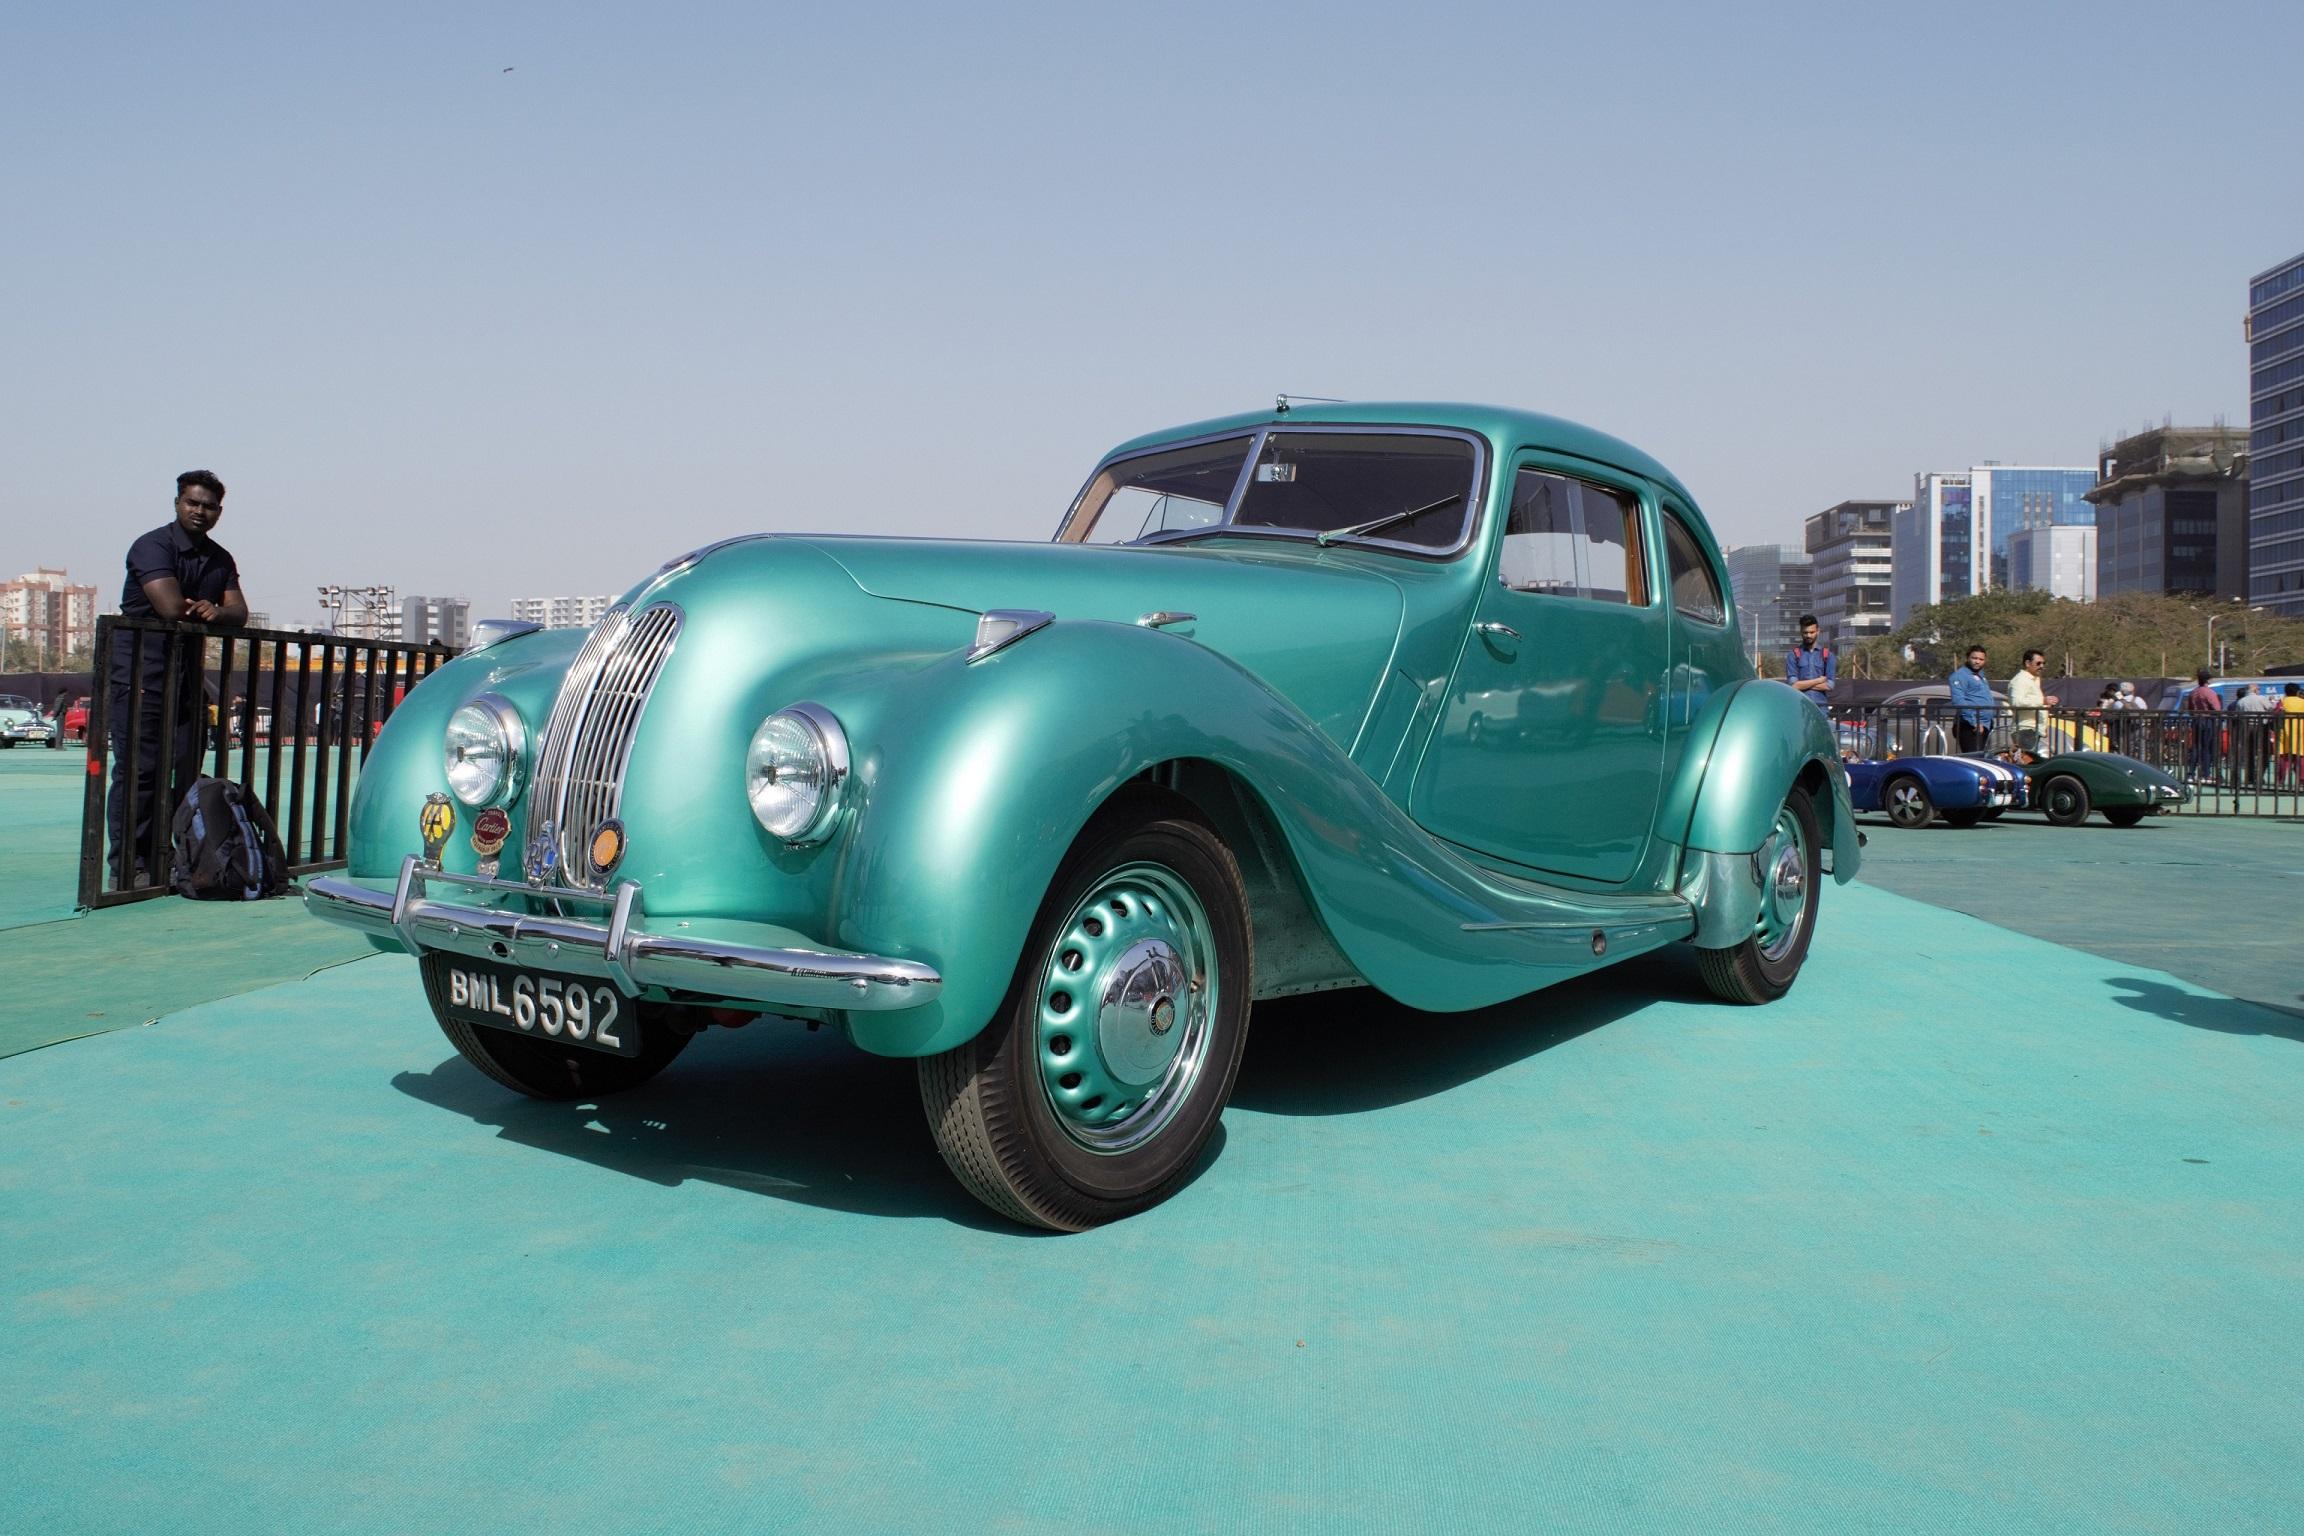 Vintage car display at Parx Auto Car show